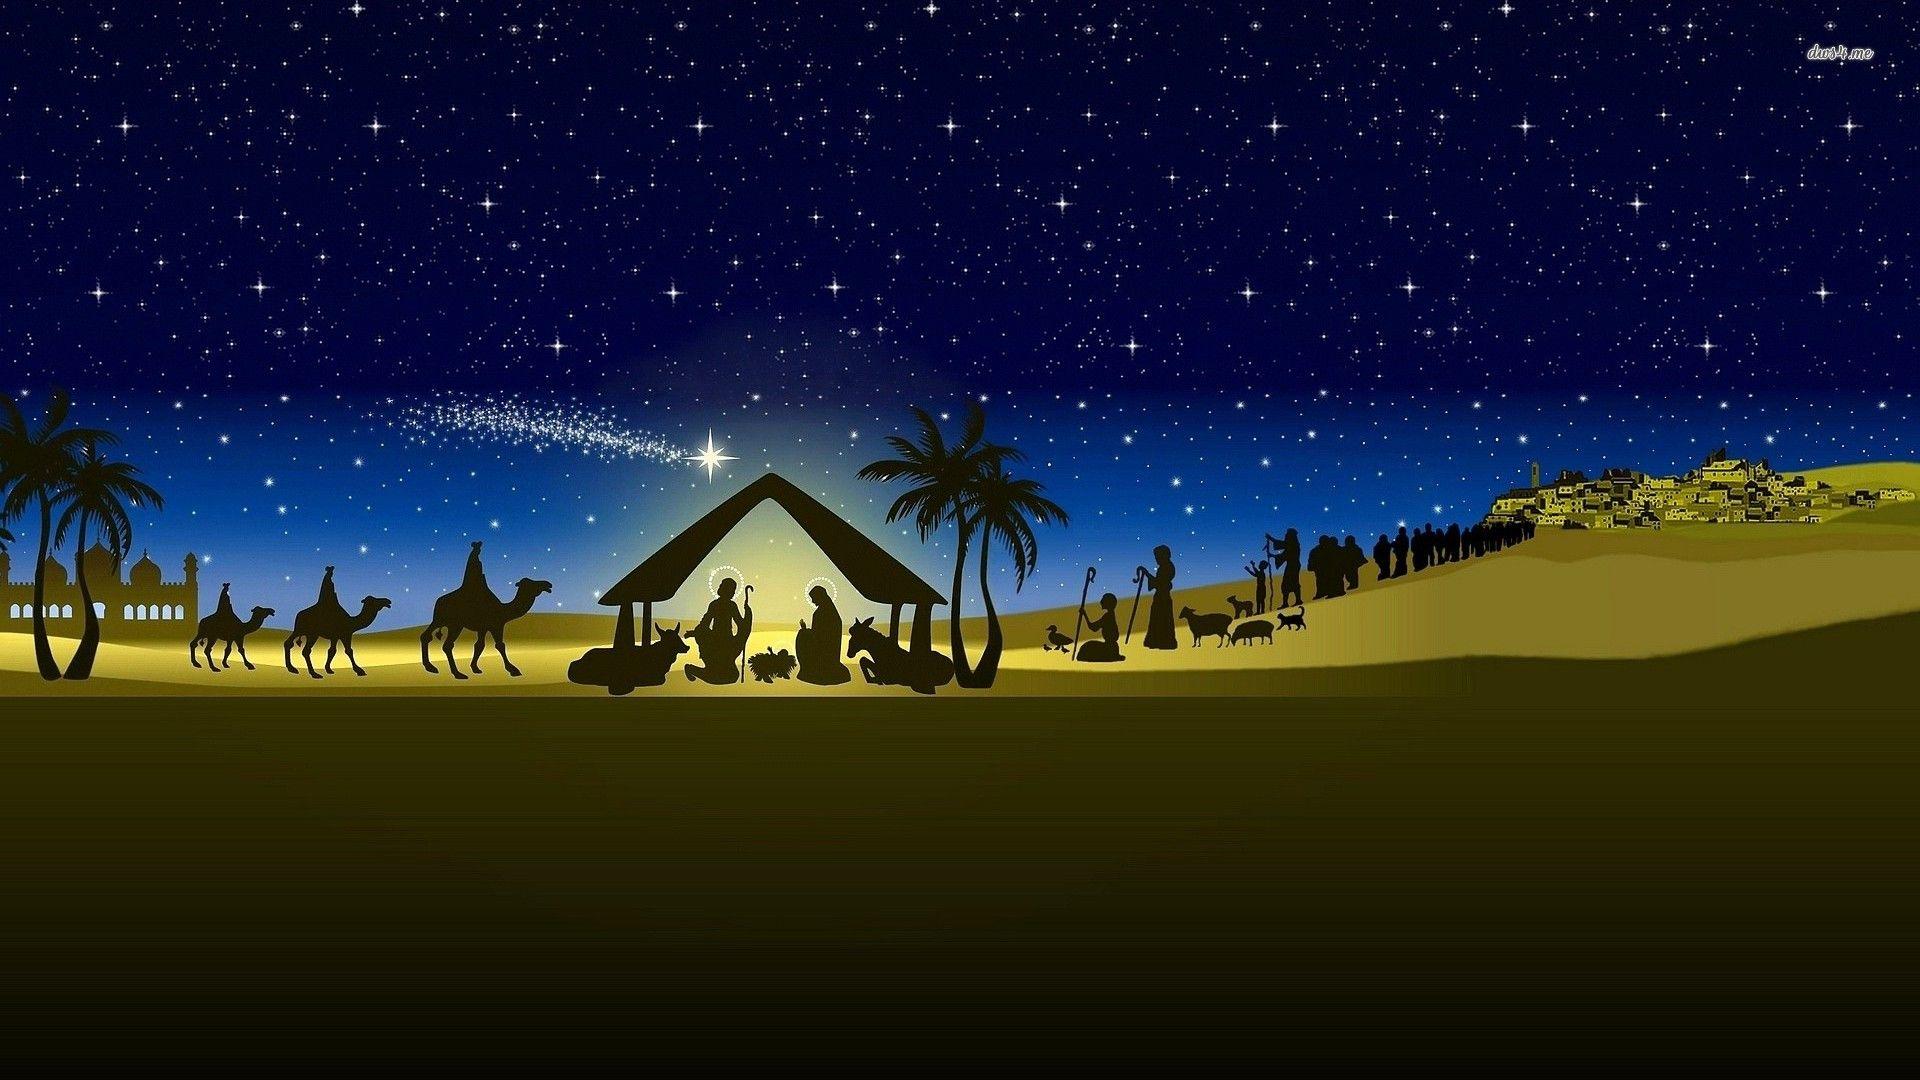 Nativity Scene Images Nativity Scene Christmas Nativity Scene Night Painting